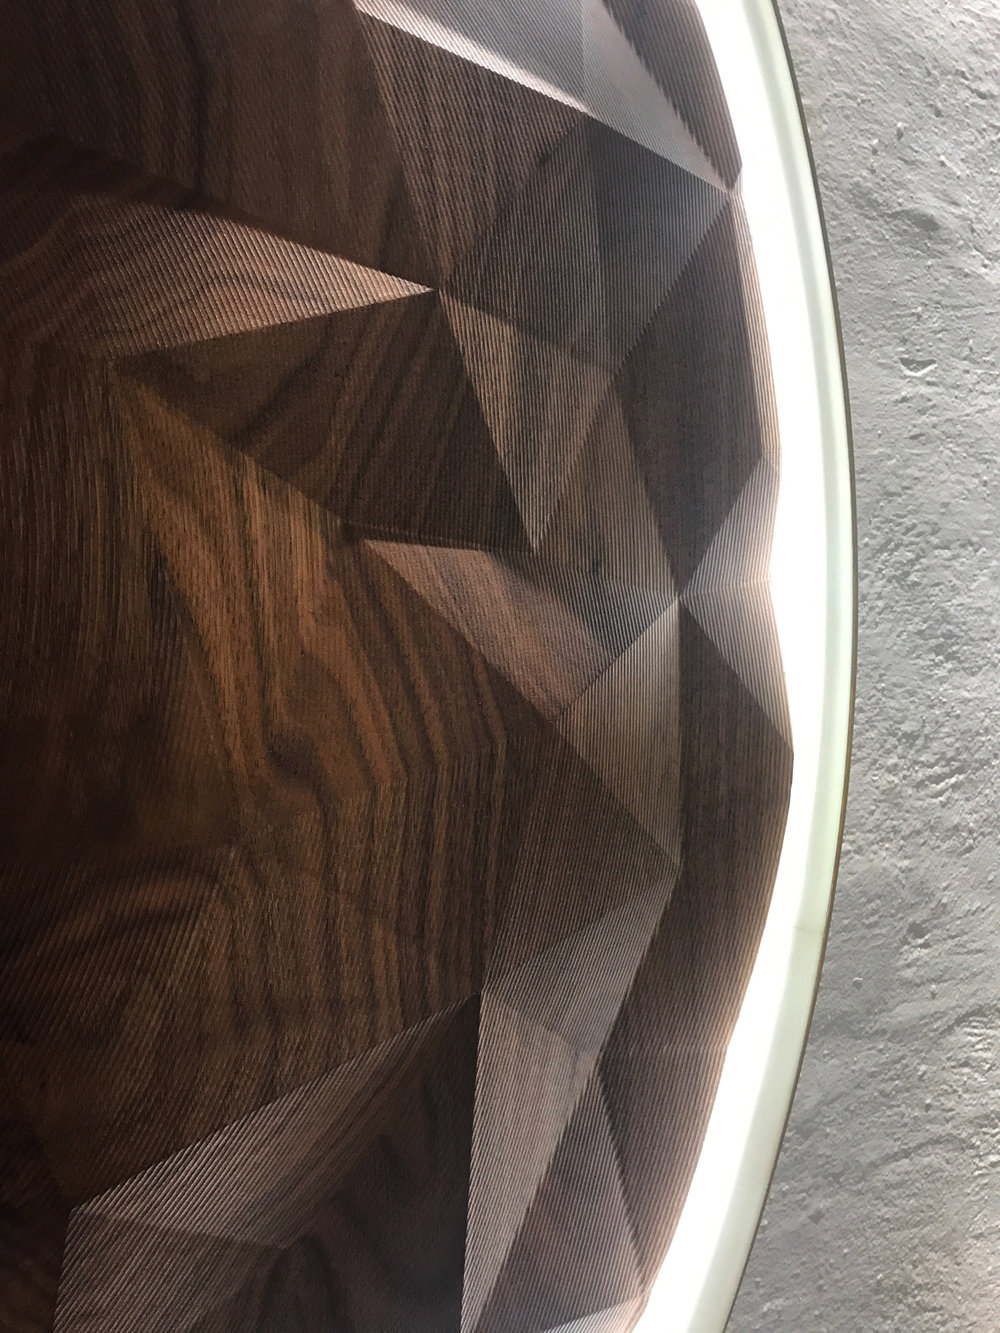 Alex-Earl-telegon-detail-melbourne-lighting.jpg